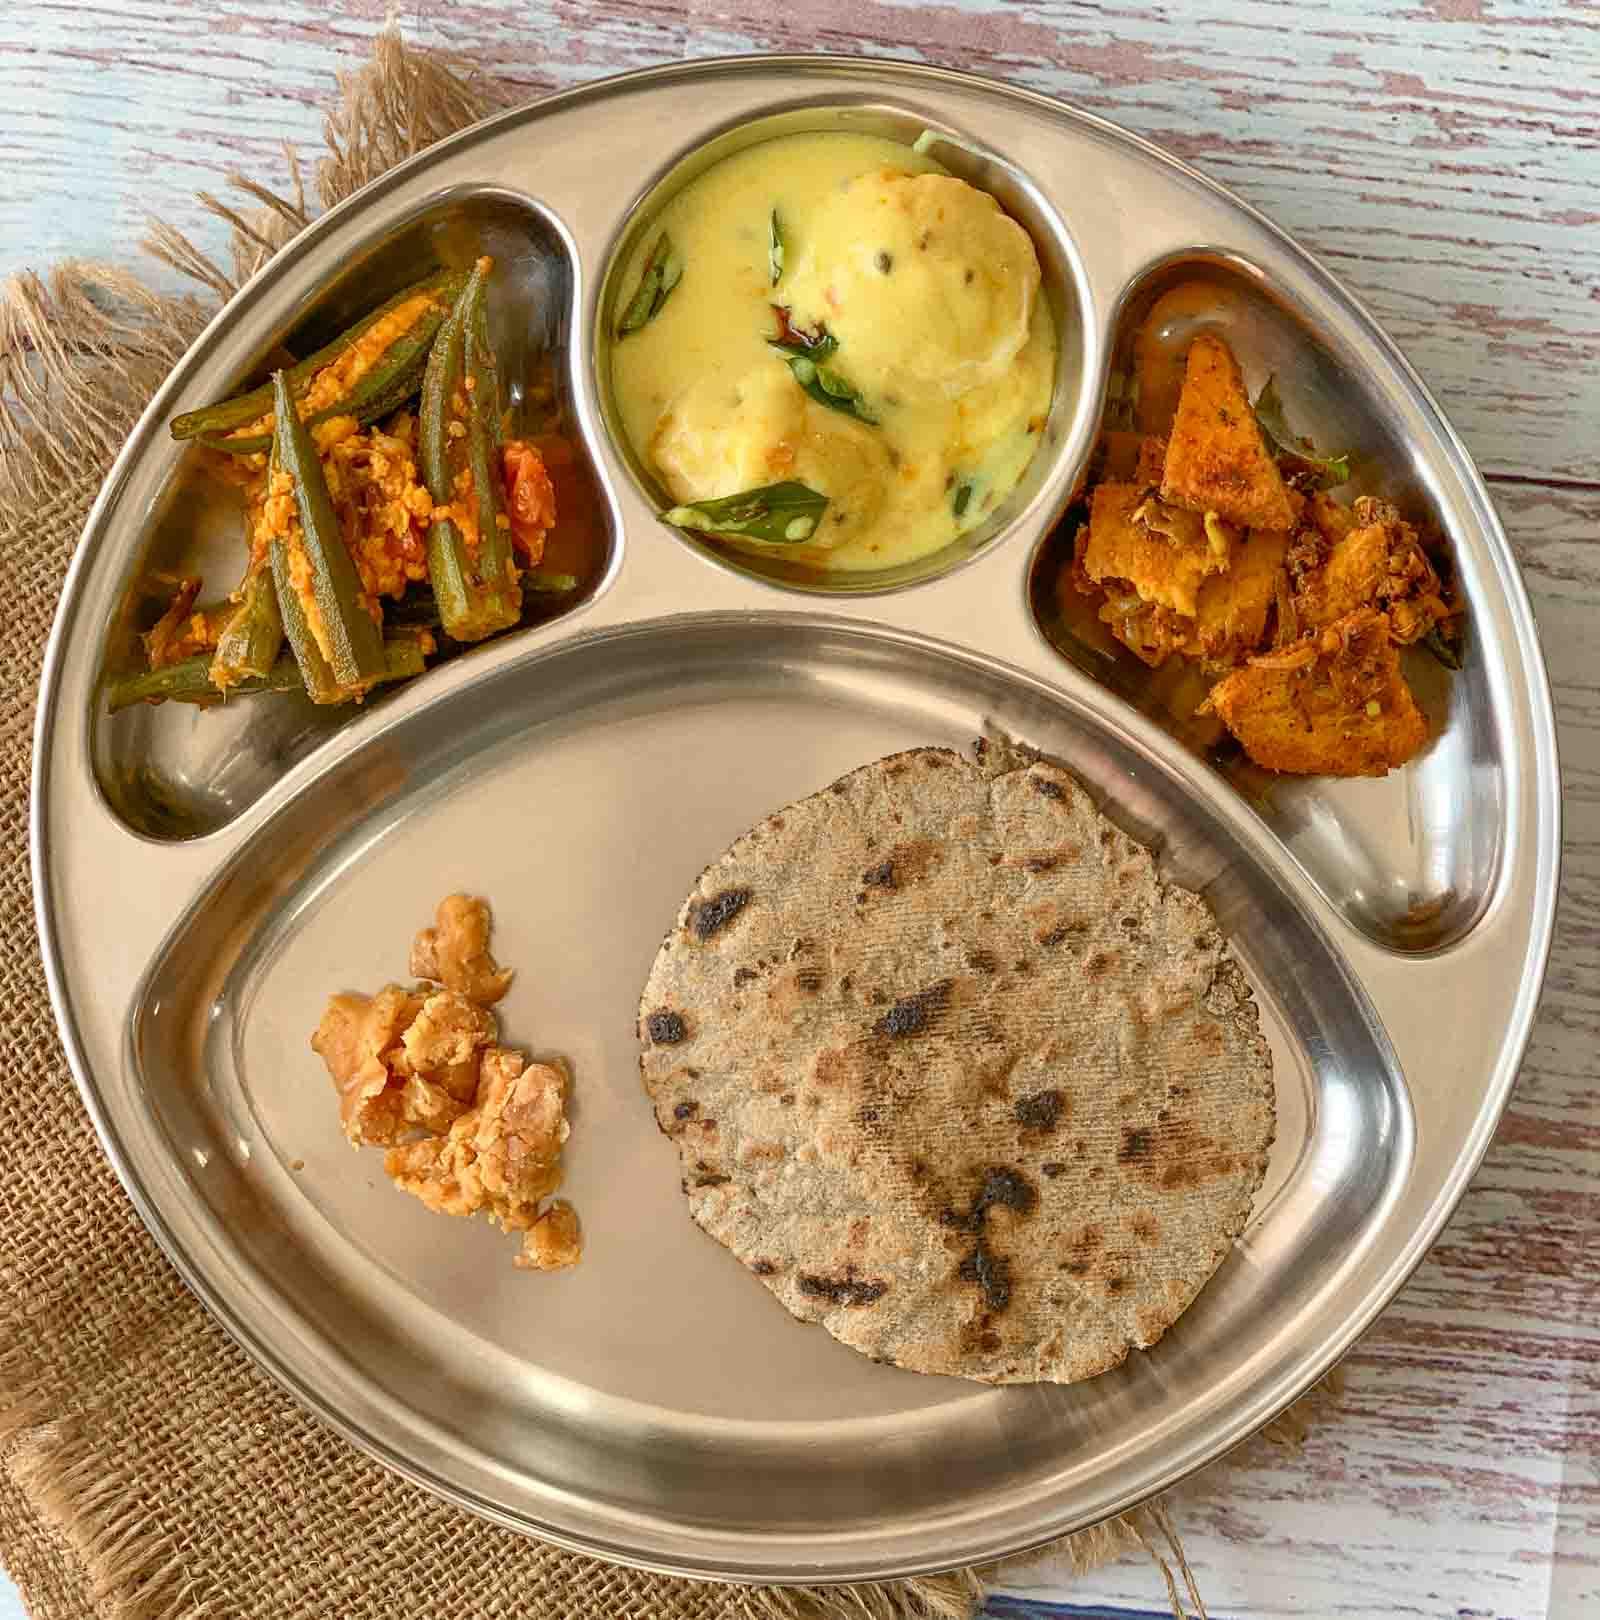 Portion Control Meal Plate-Khadi Bari, Stuffed Bhindi With Paneer,Suran Sukhi Sabzi & Bajra Roti